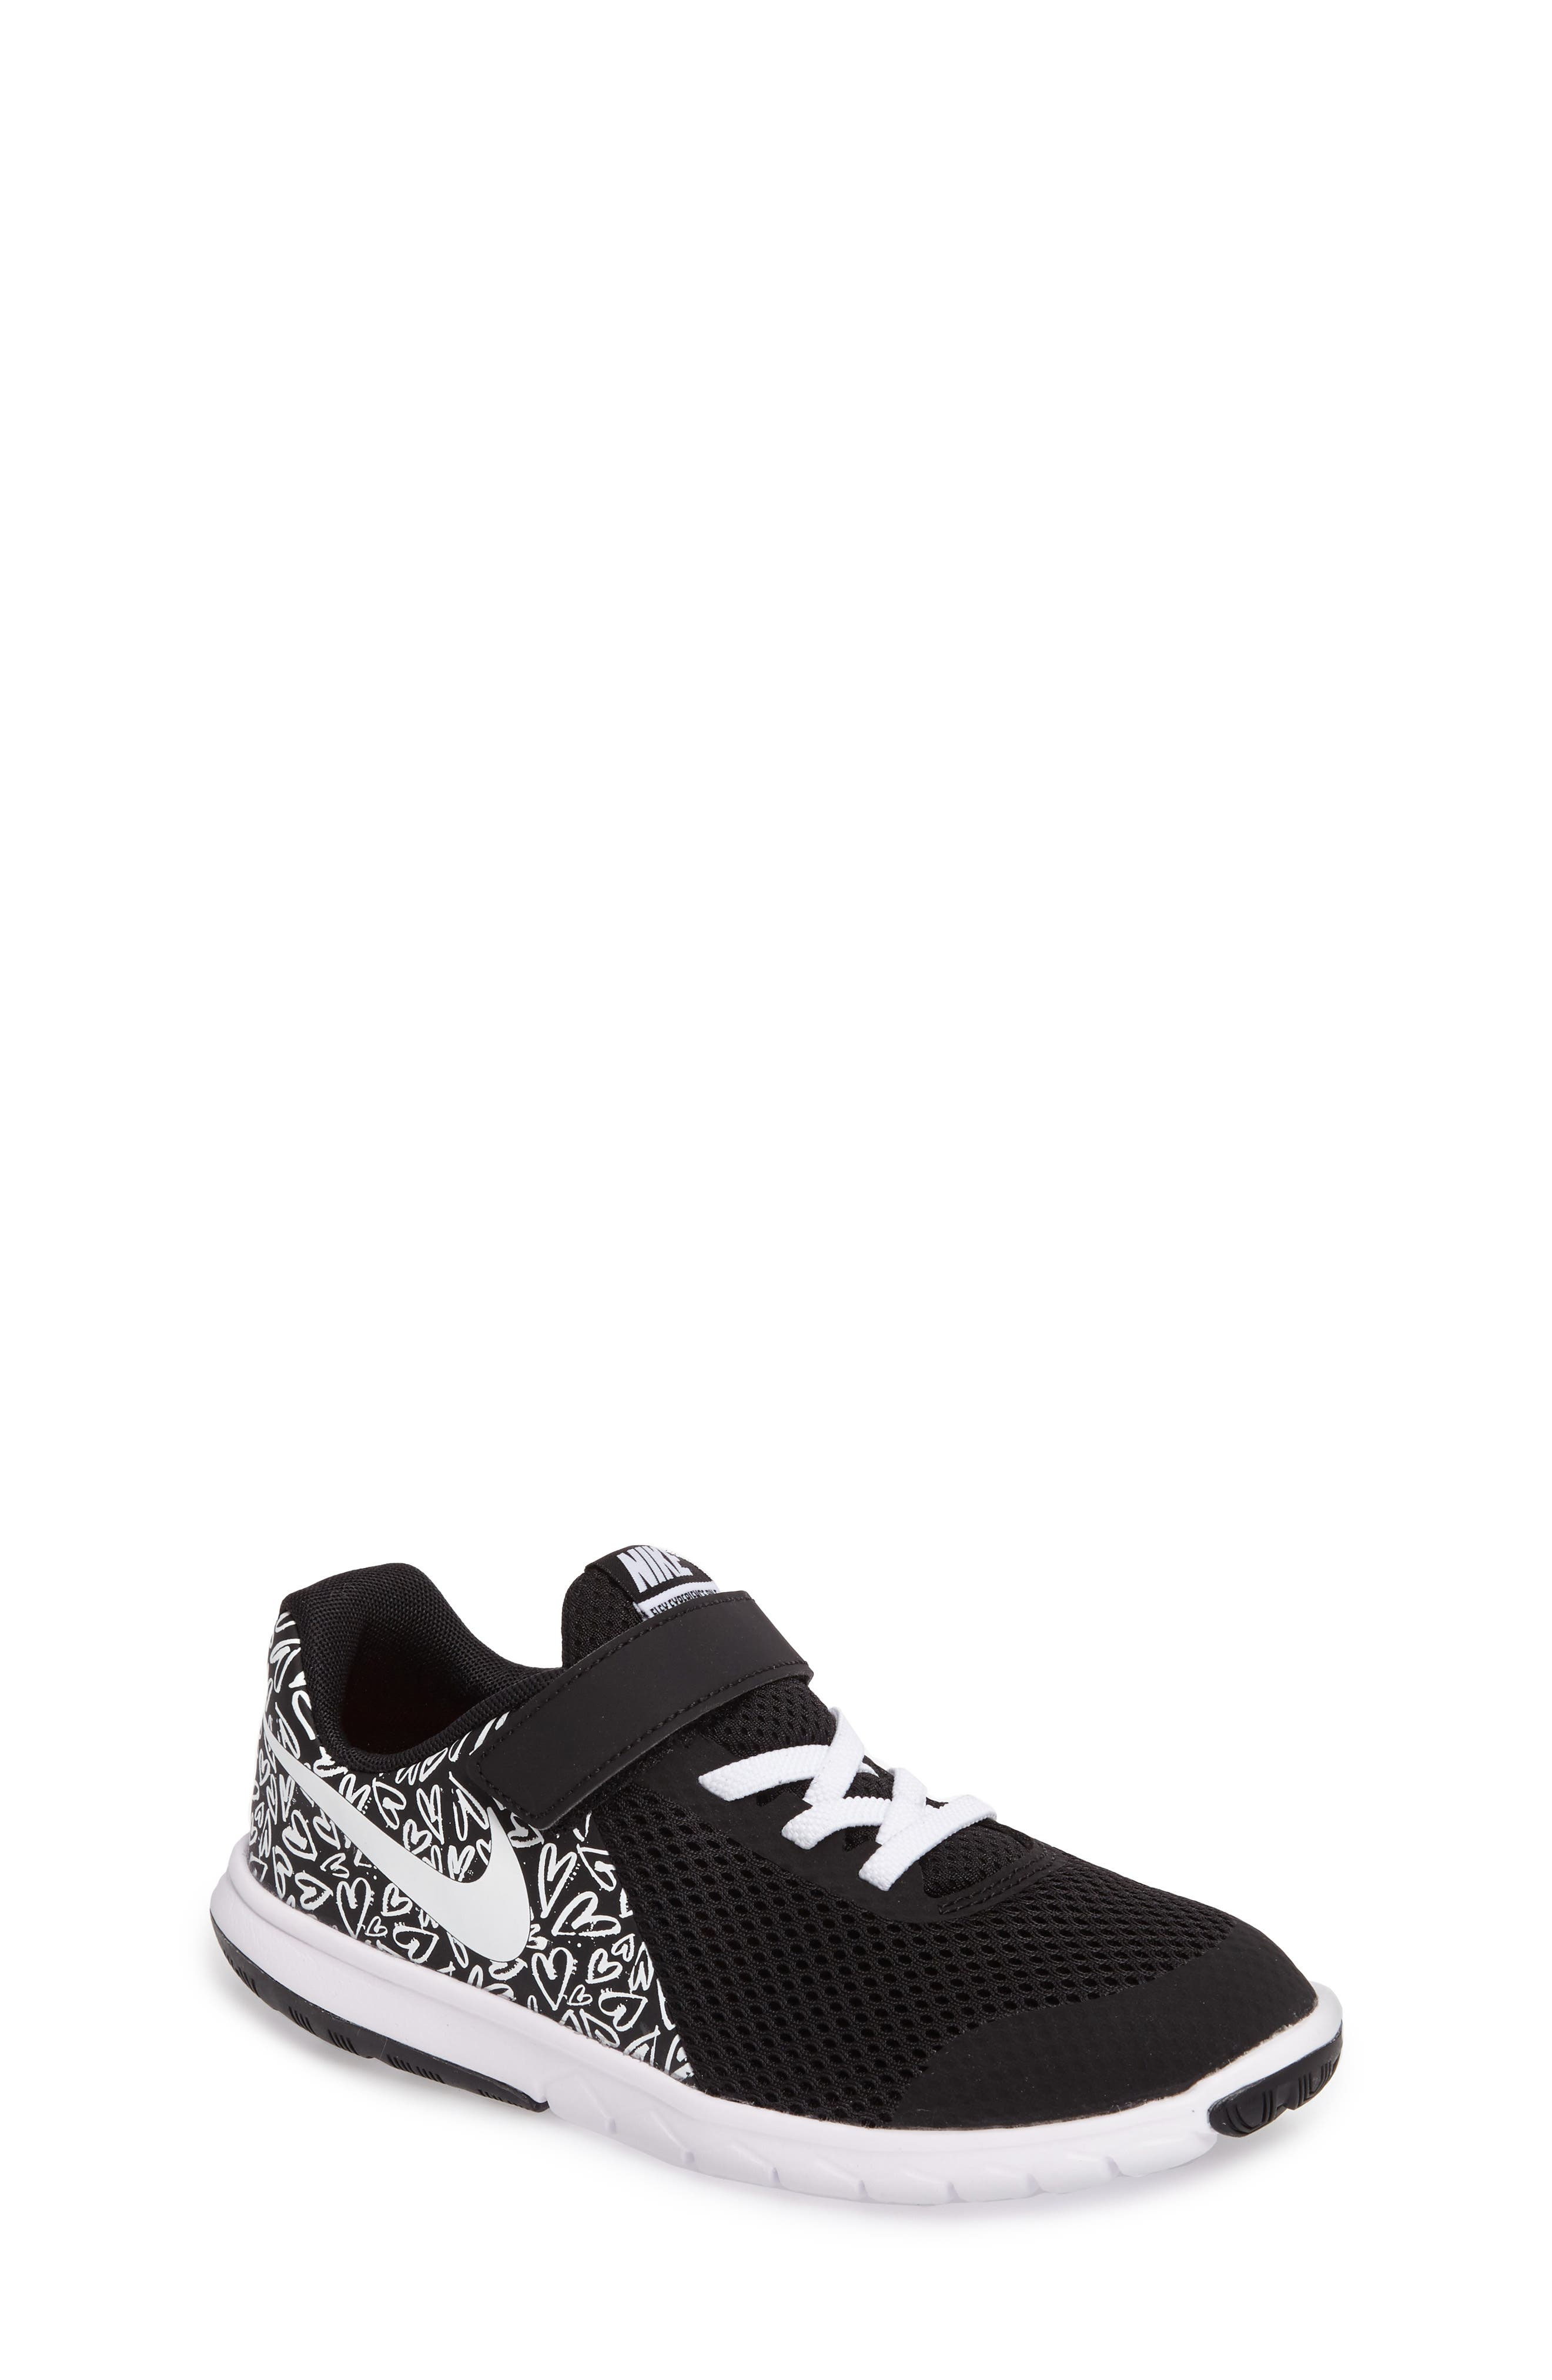 Alternate Image 1 Selected - Nike 'Flex Experience 5' Running Shoe (Toddler & Little Kid)